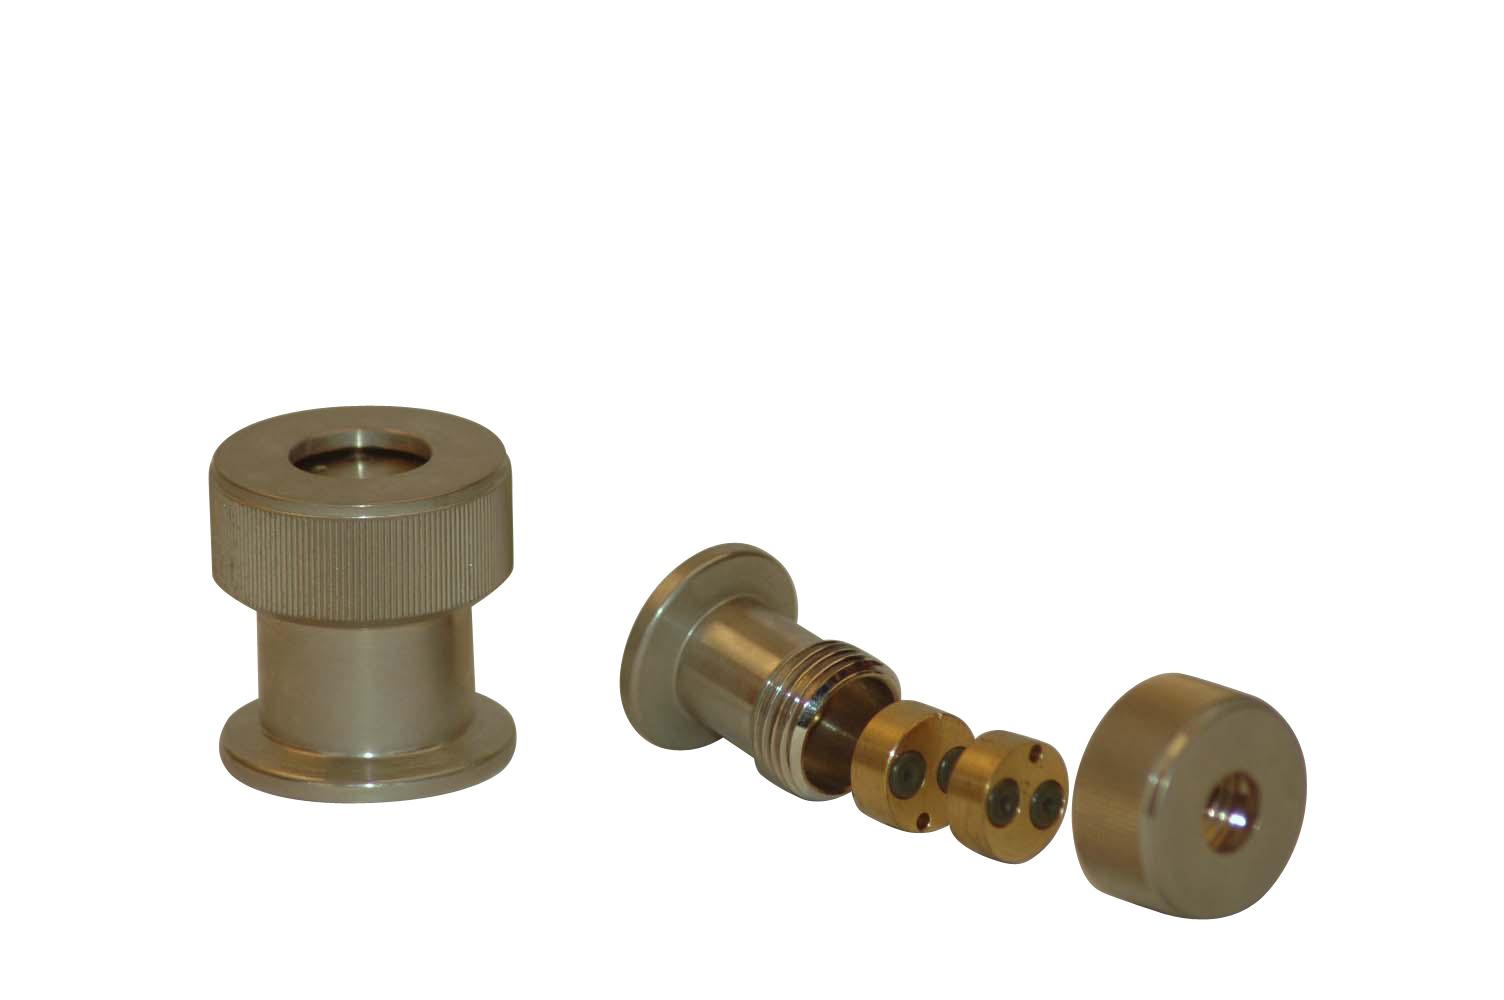 Themocouple feedthrough 6 pins, stainless steel, DN25KF